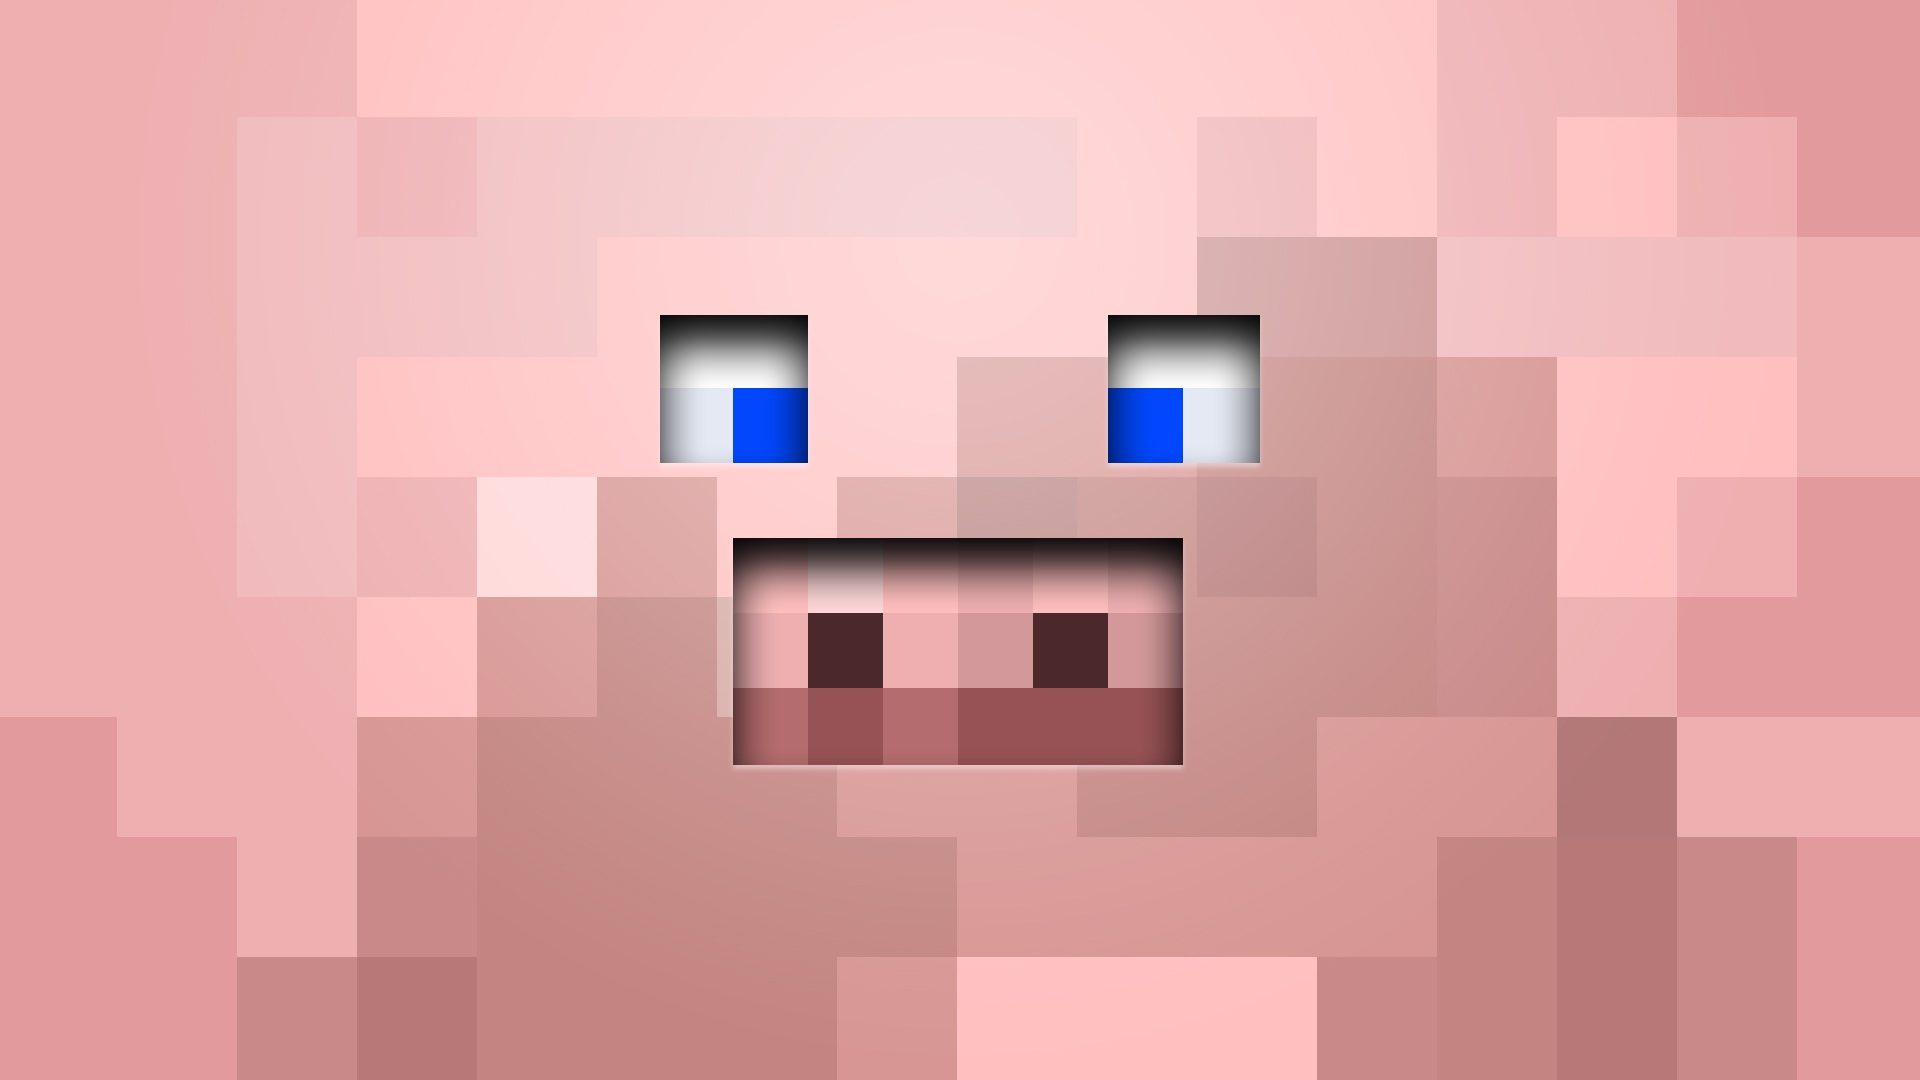 Fantastic Wallpaper Minecraft Zombie Pigman - pic_1390735928_3  Pictures_1003528.jpg?1436189148